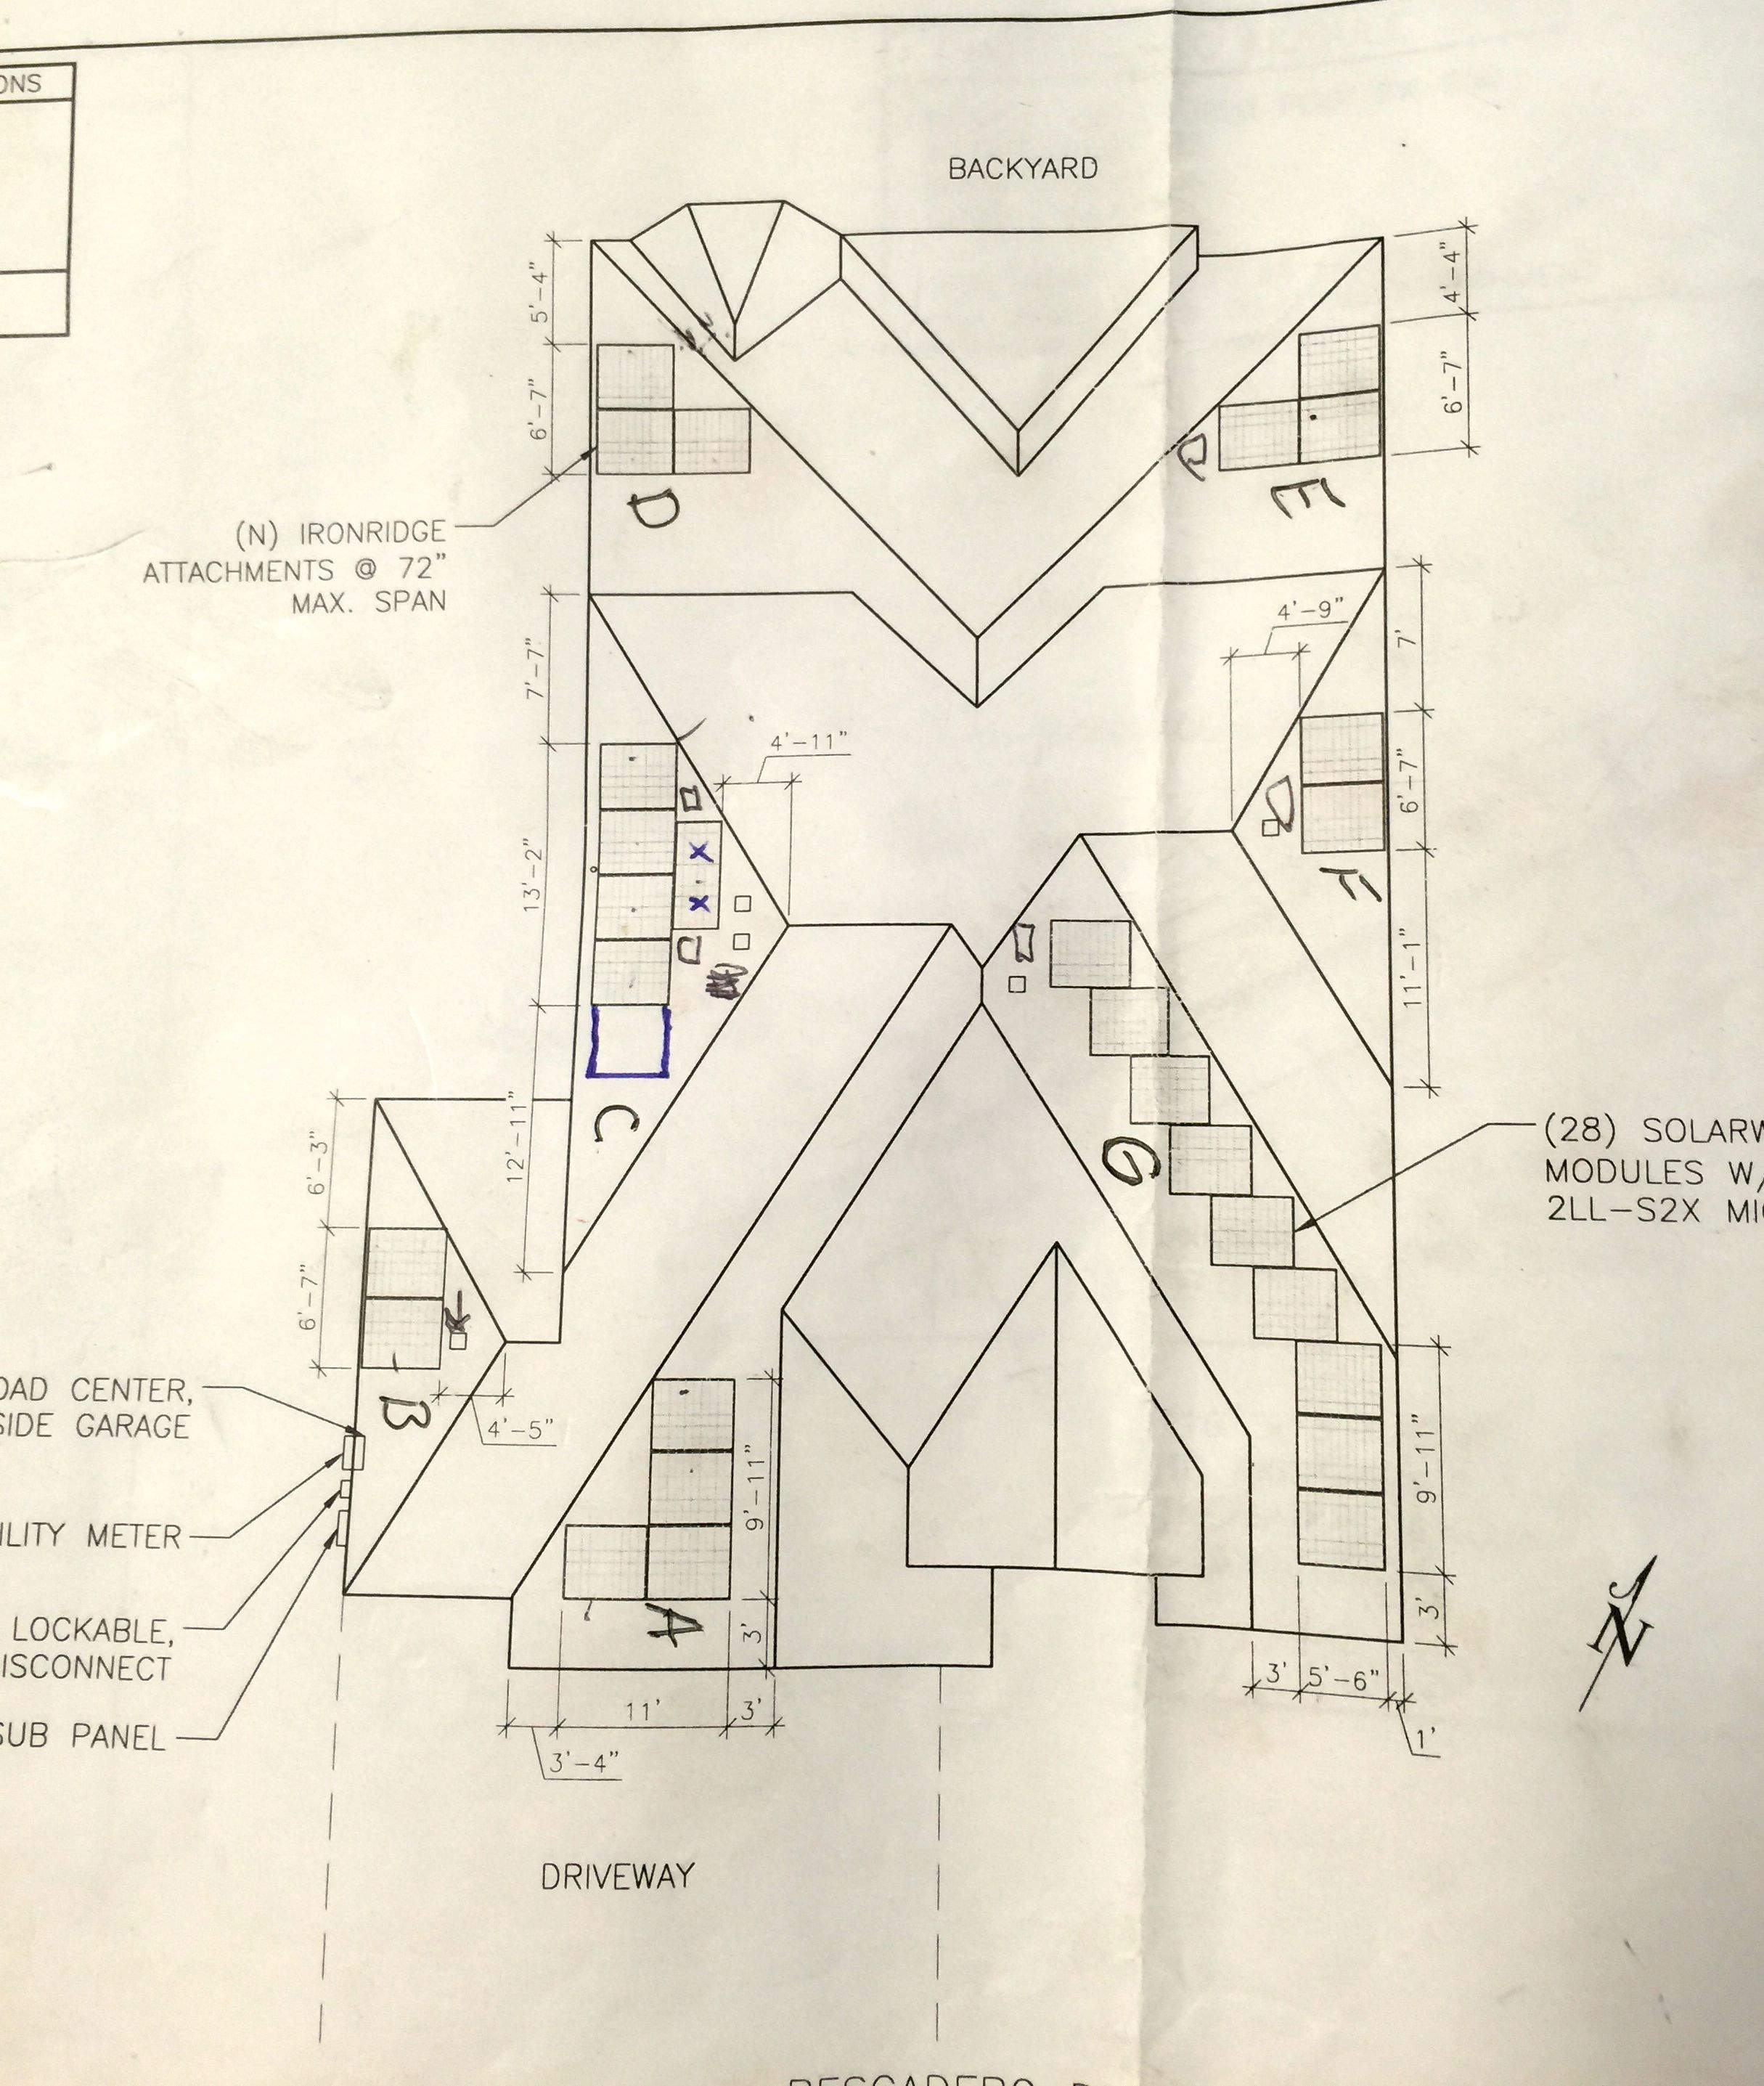 50 kw pv wiring diagram wiring diagrams 50 kw pv wiring diagram diagrams base